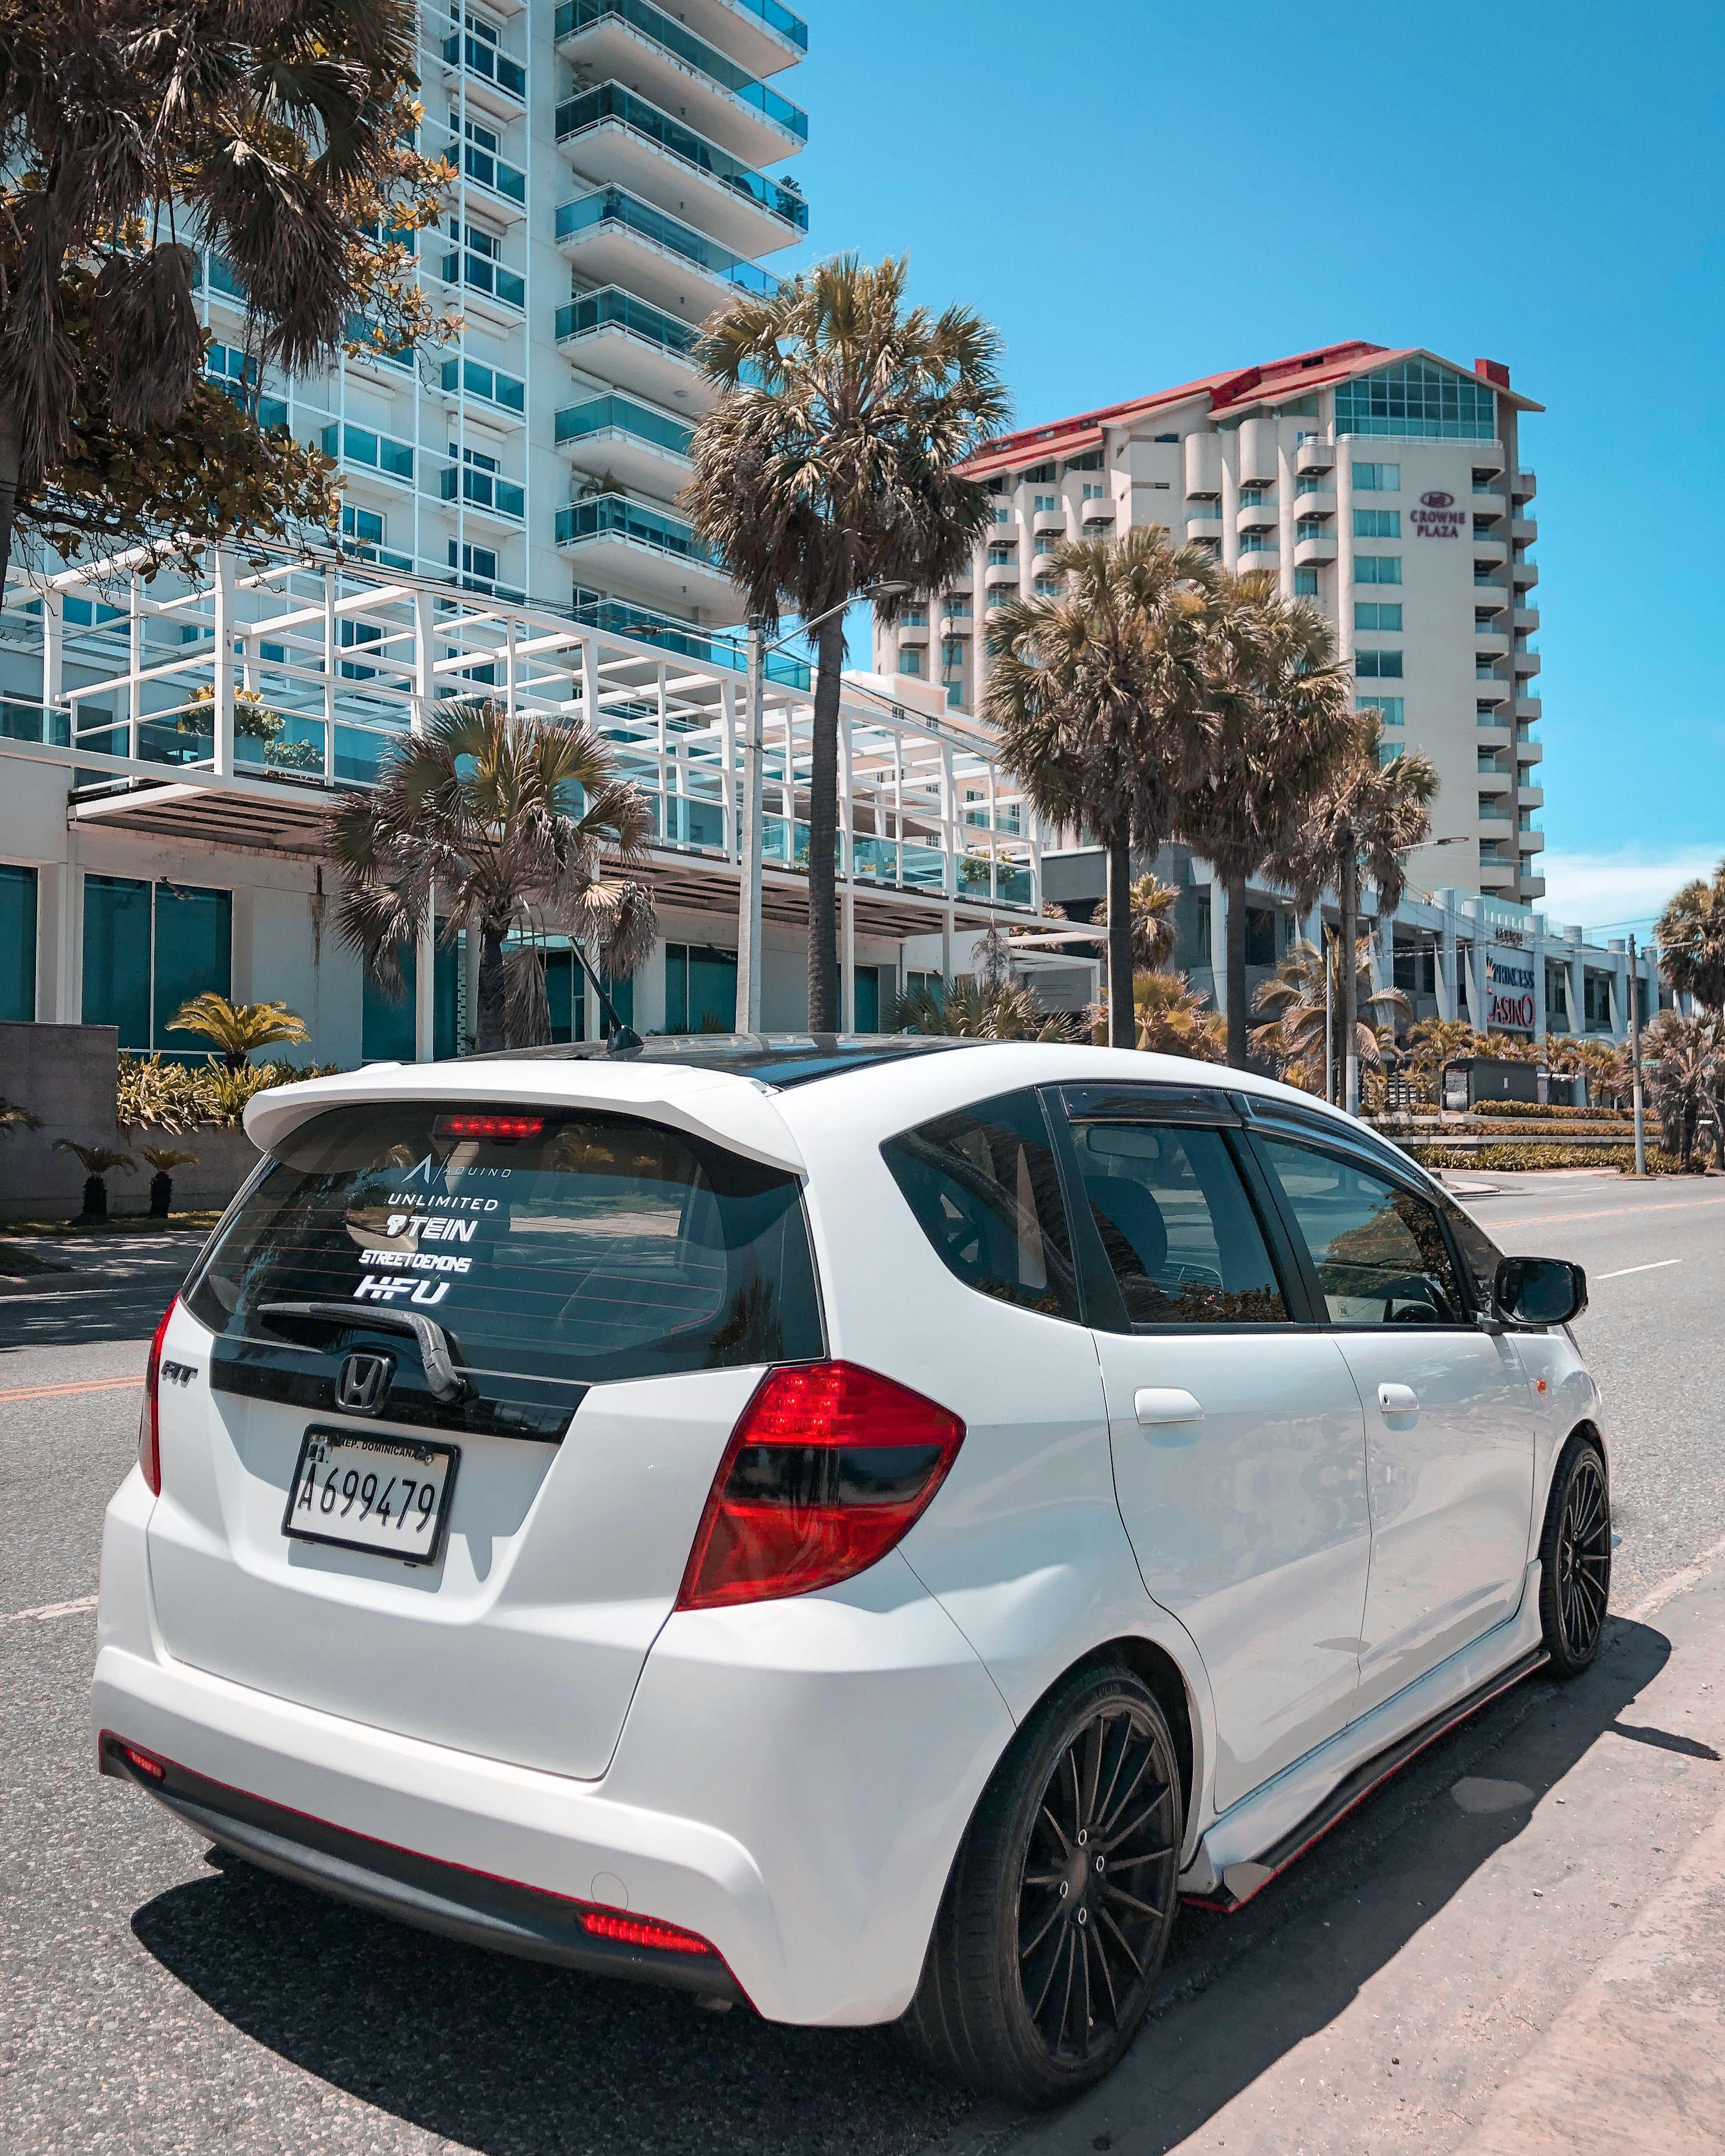 Honda Fit Tuning In 2020 Honda Fit Honda Bmw Car